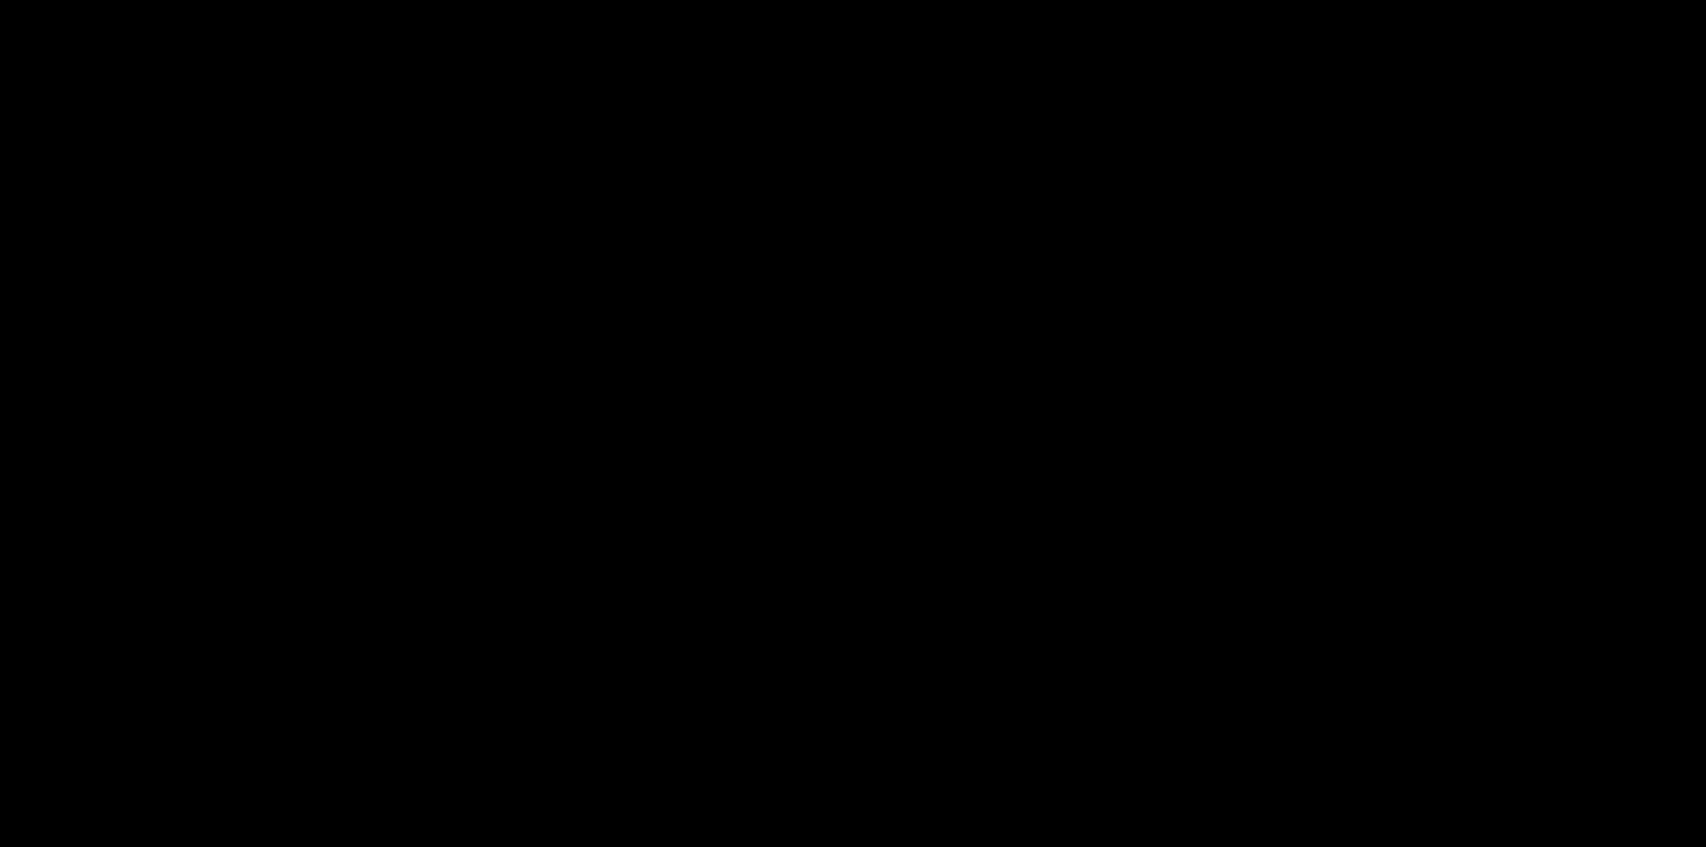 IMG 91001